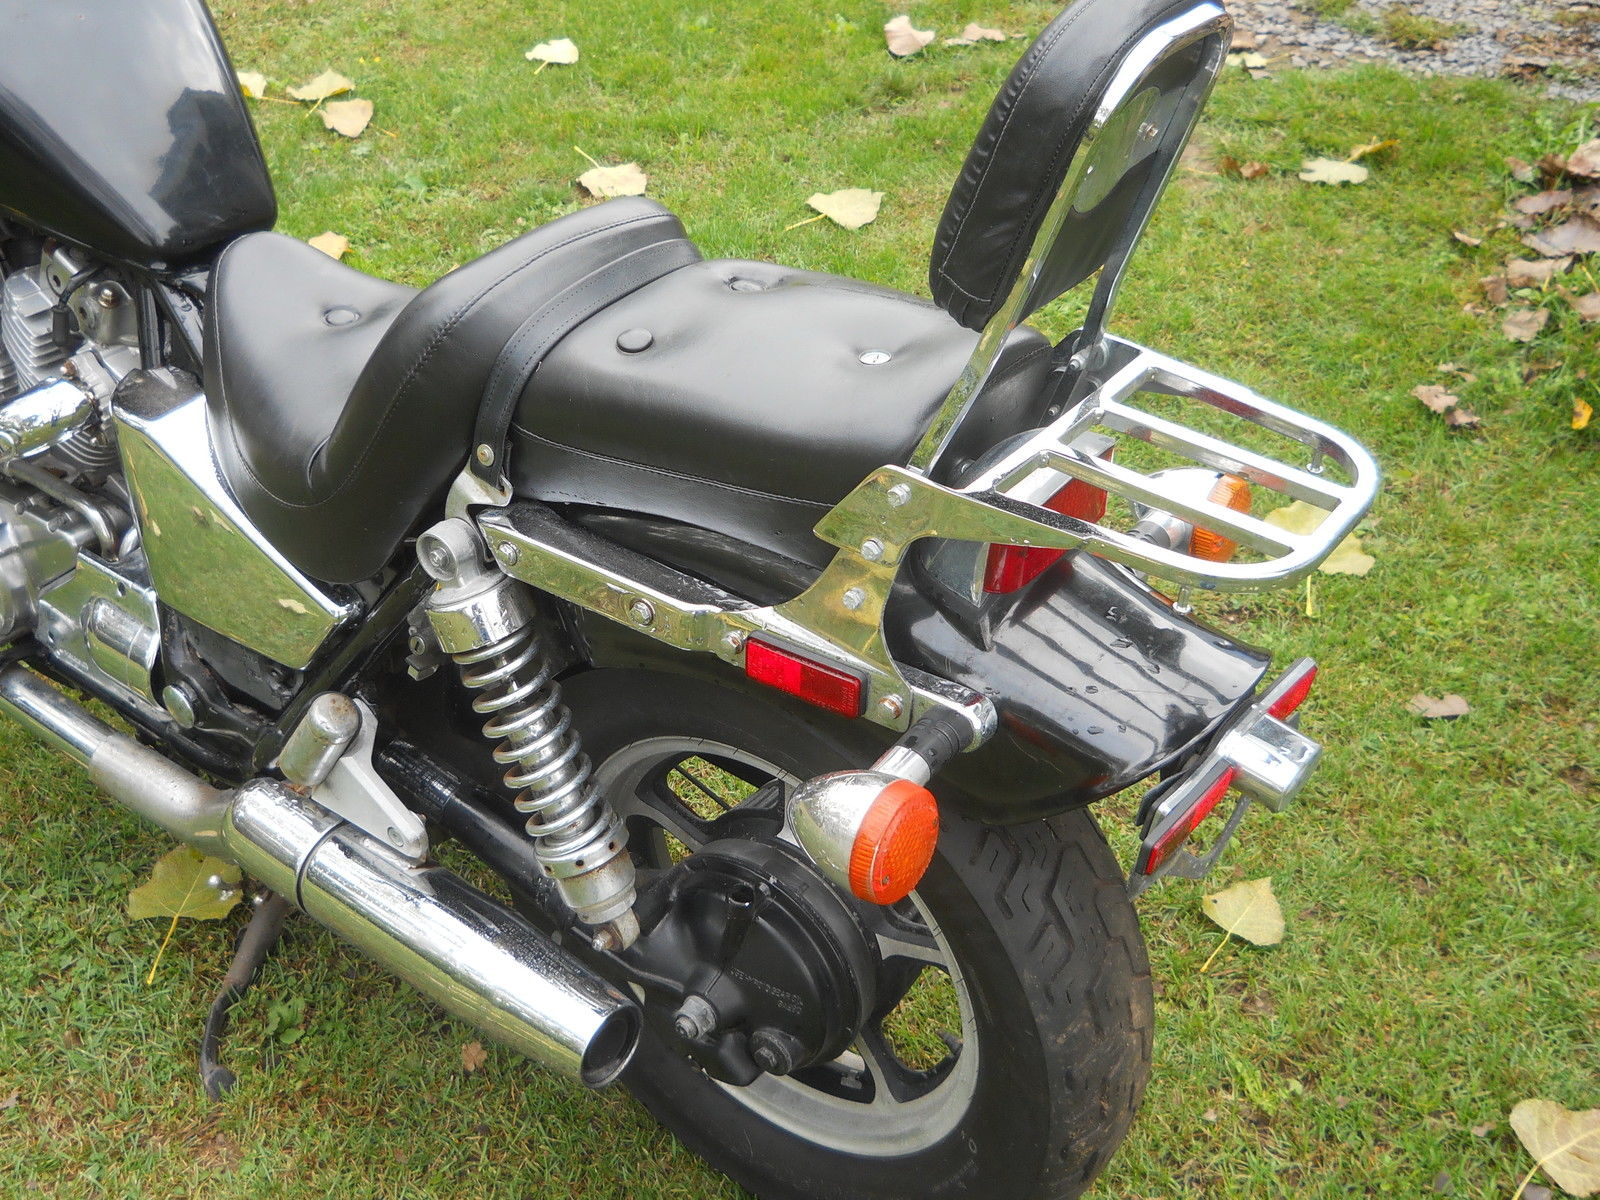 1986 HONDA VT700C SHADOW MOTORCYCLE VT 700 BOBBER PROJECT PARTS BIKE RESTORE